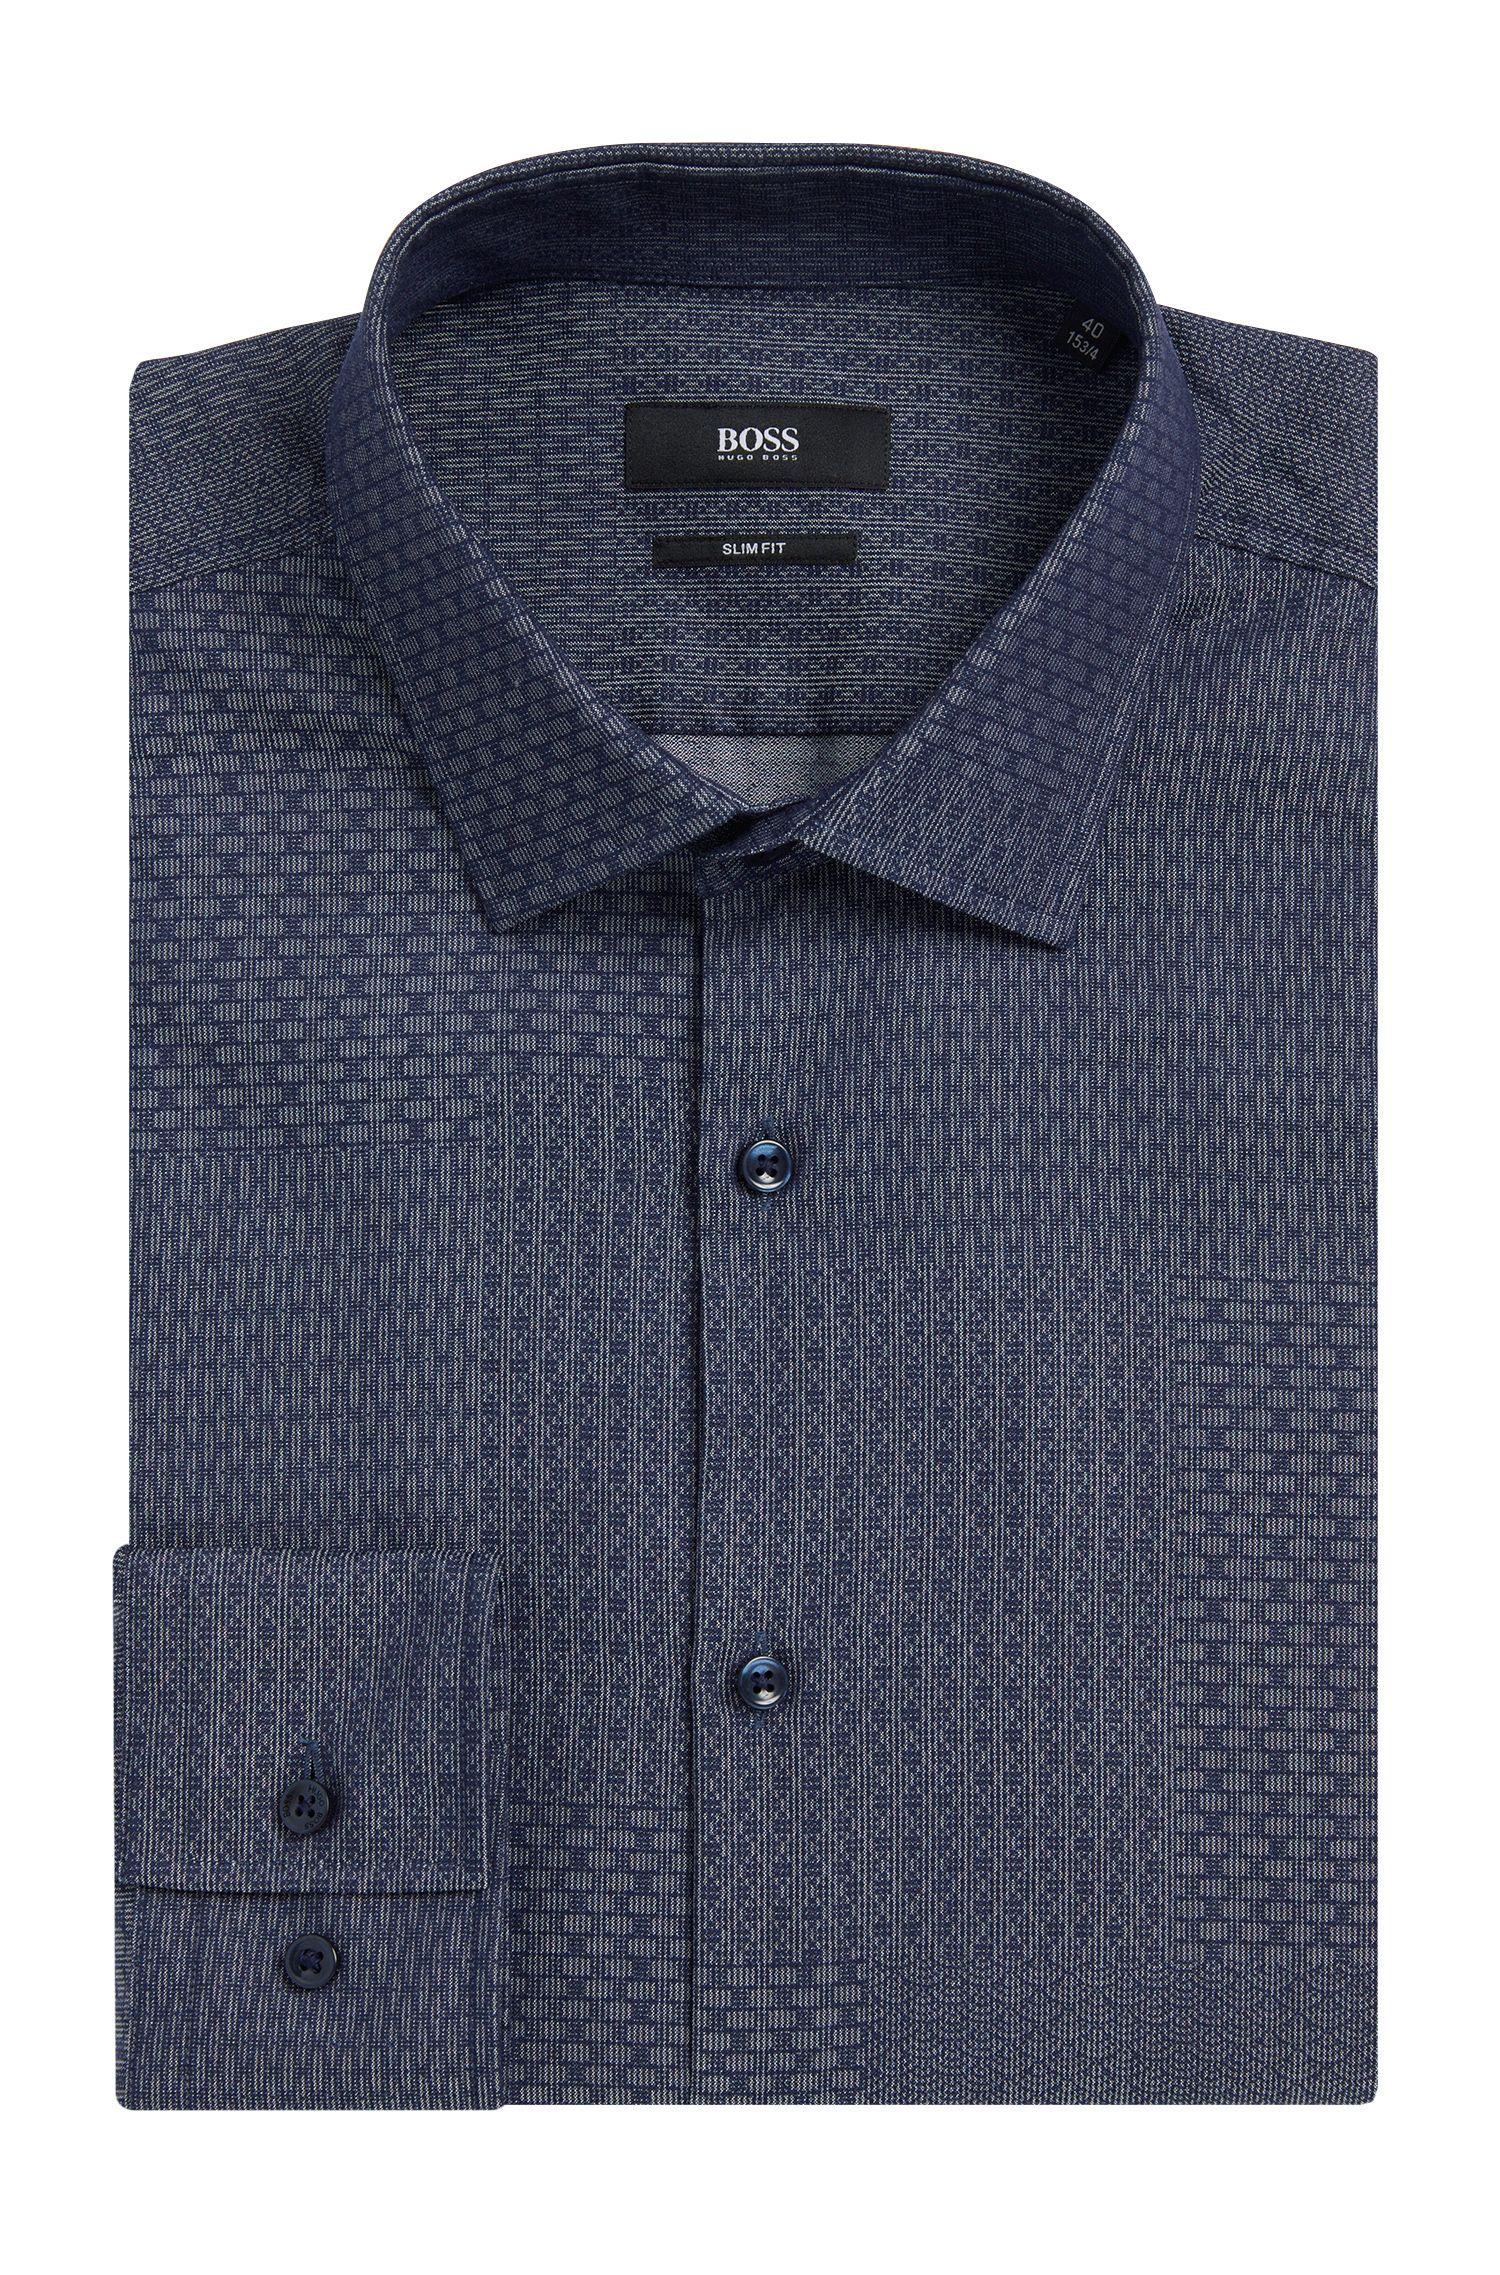 Dobby Patchwork Cotton Dress Shirt, Slim Fit   Jenno